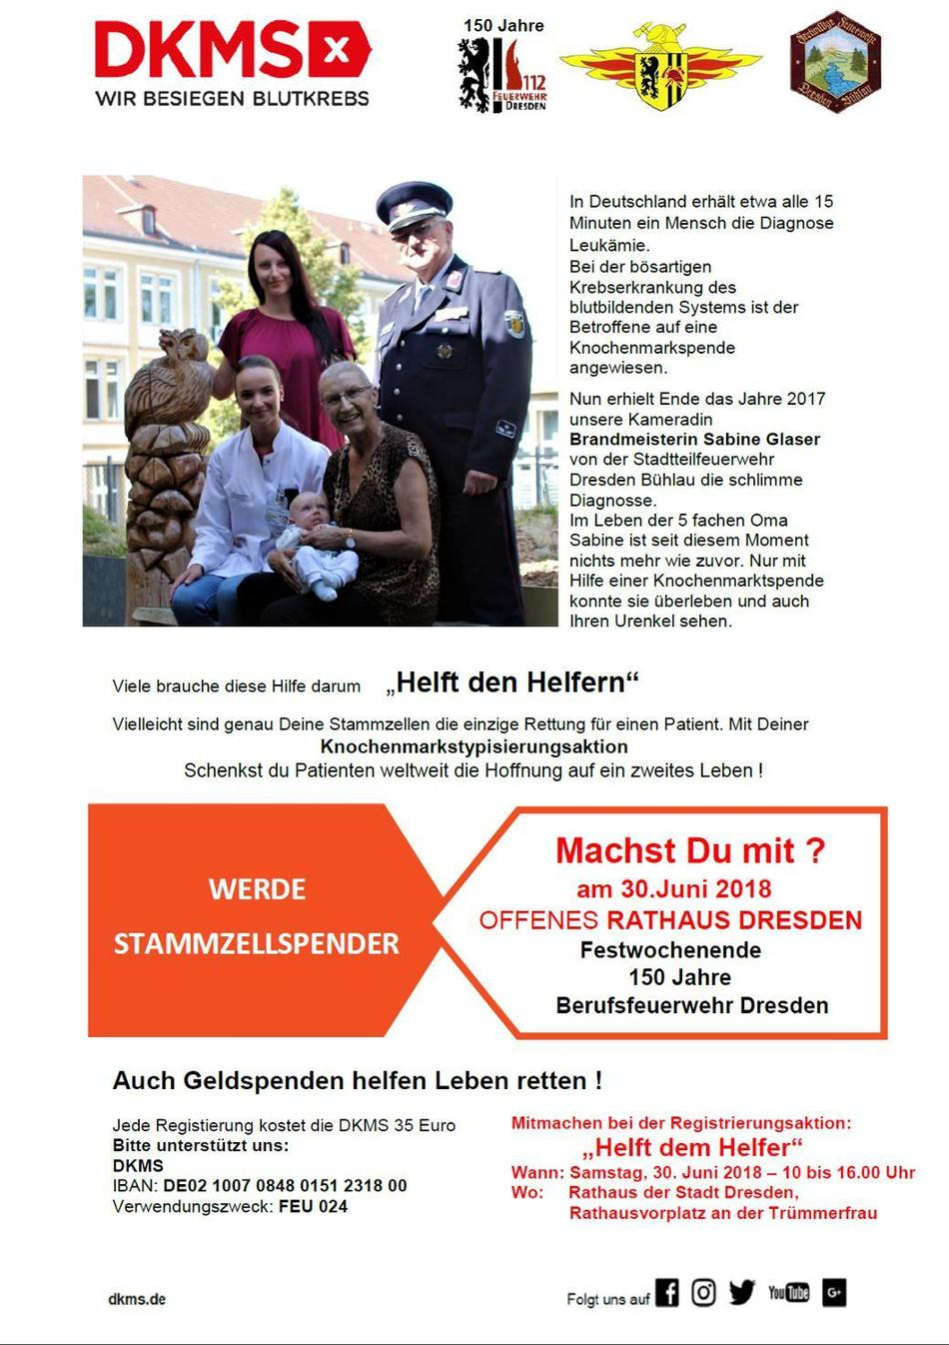 © Stadtfeuerwehrverbandes Dresden e.V.